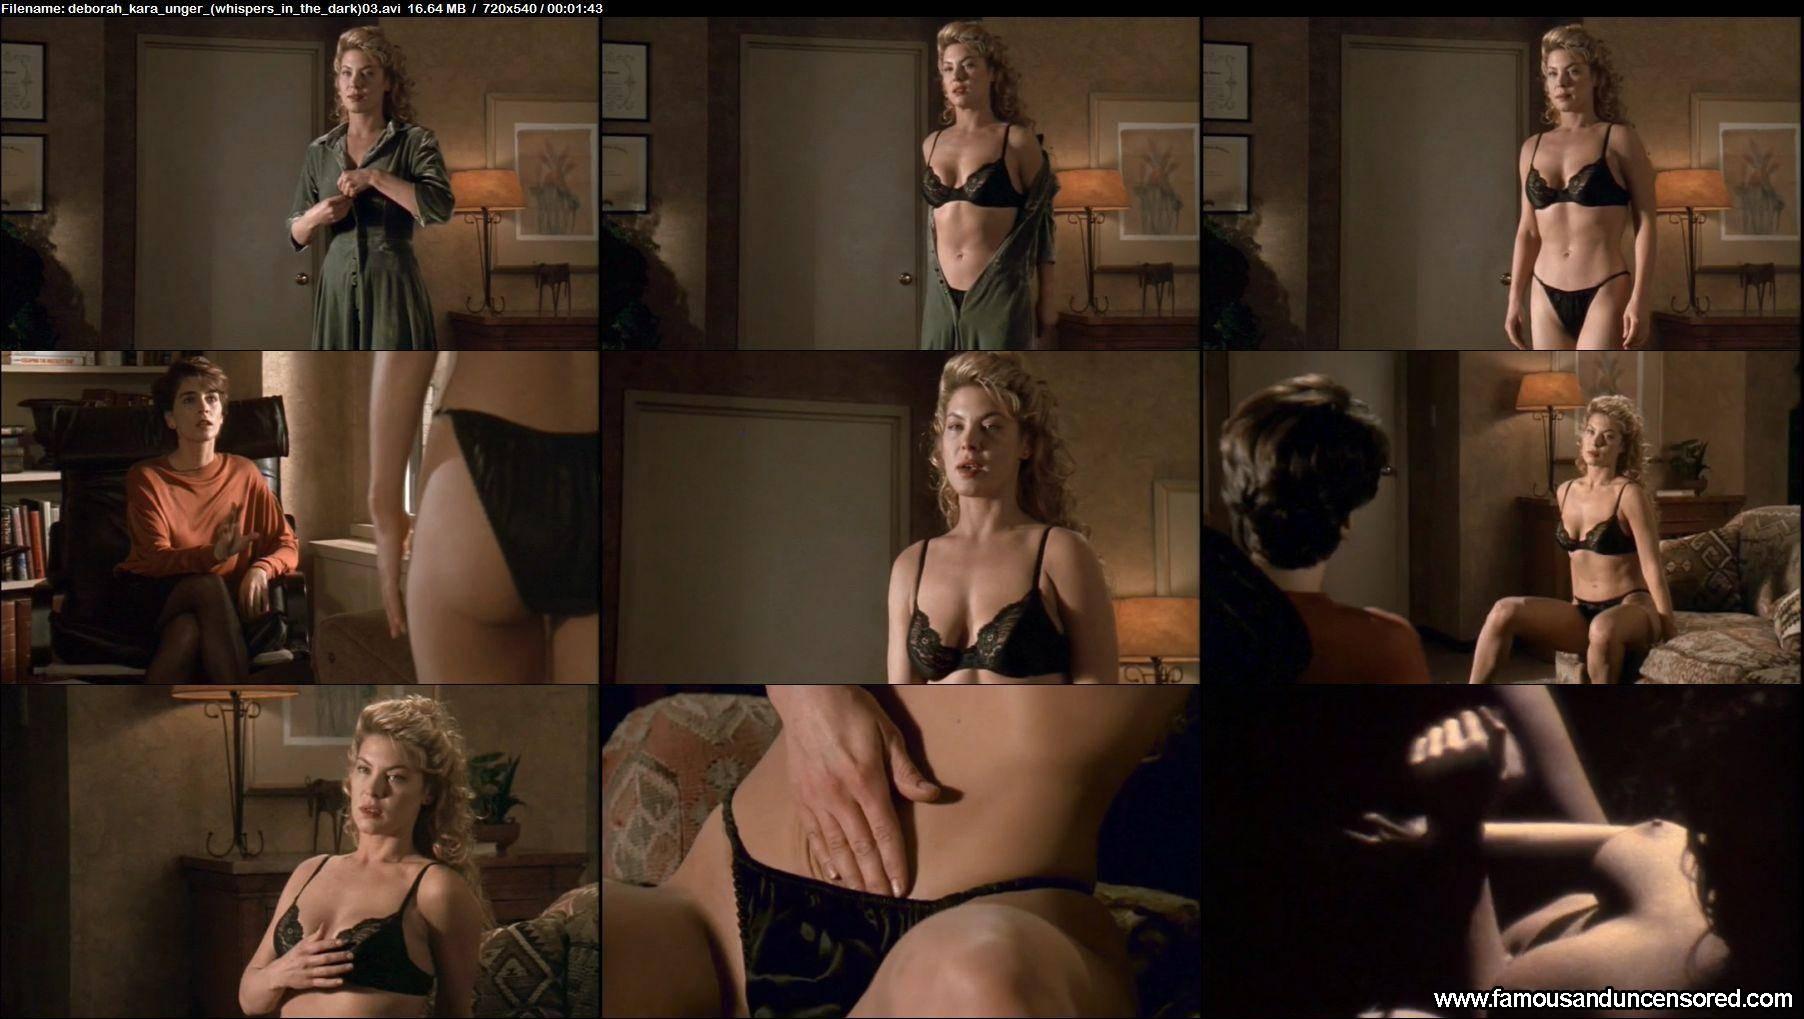 Deborah rennard in nude, free porn pics juicy asses